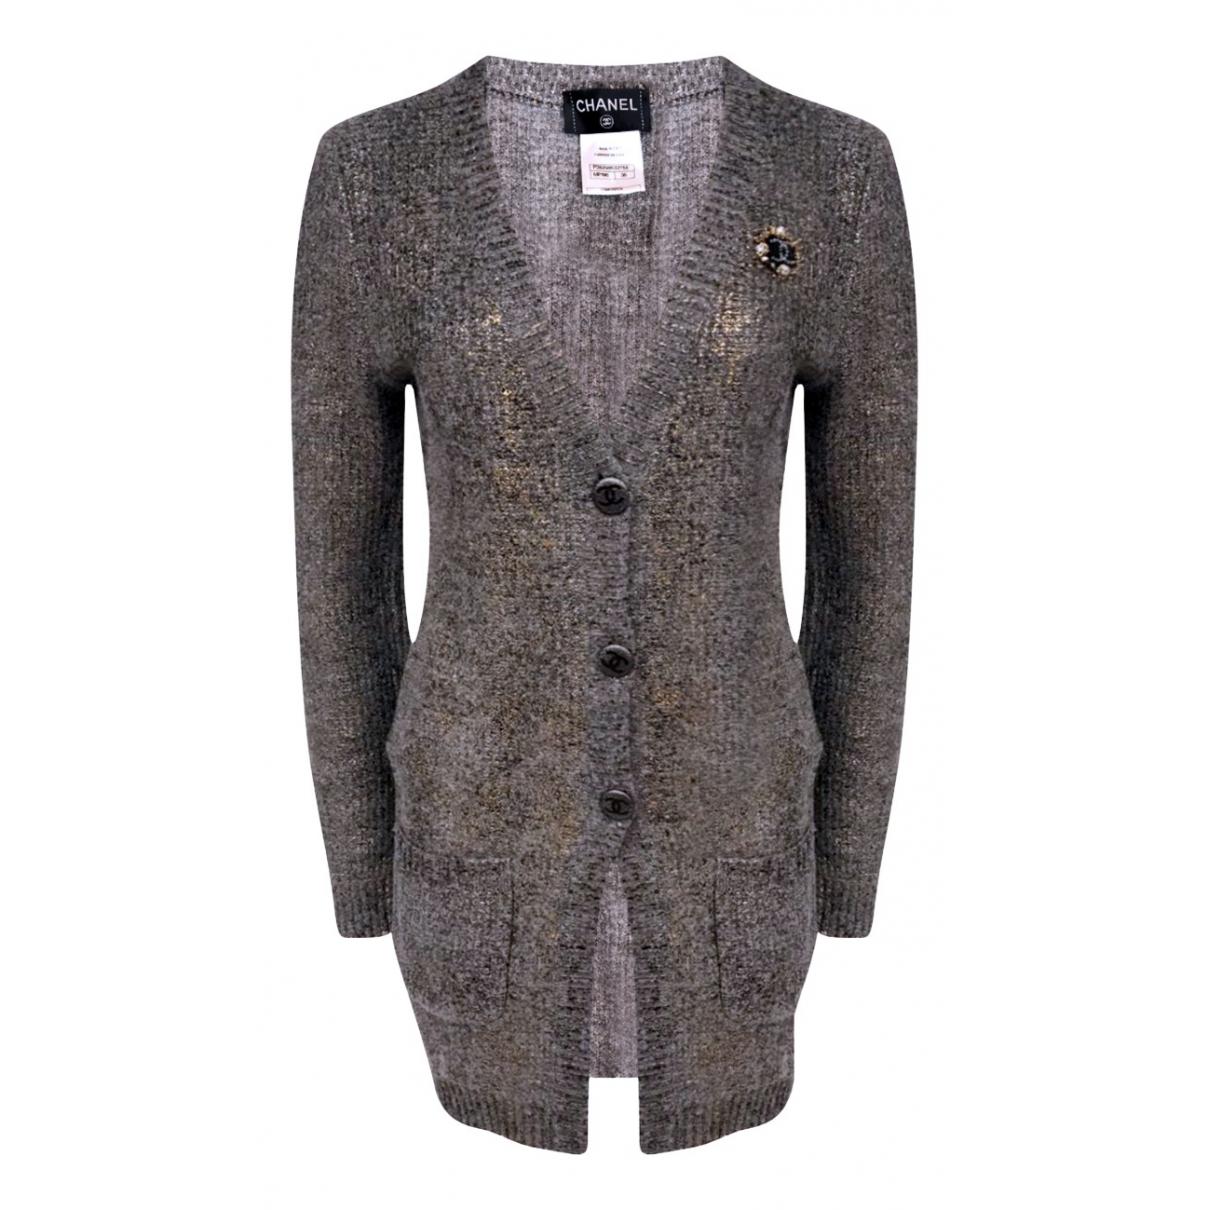 Chanel N Grey Cashmere Knitwear for Women 36 FR